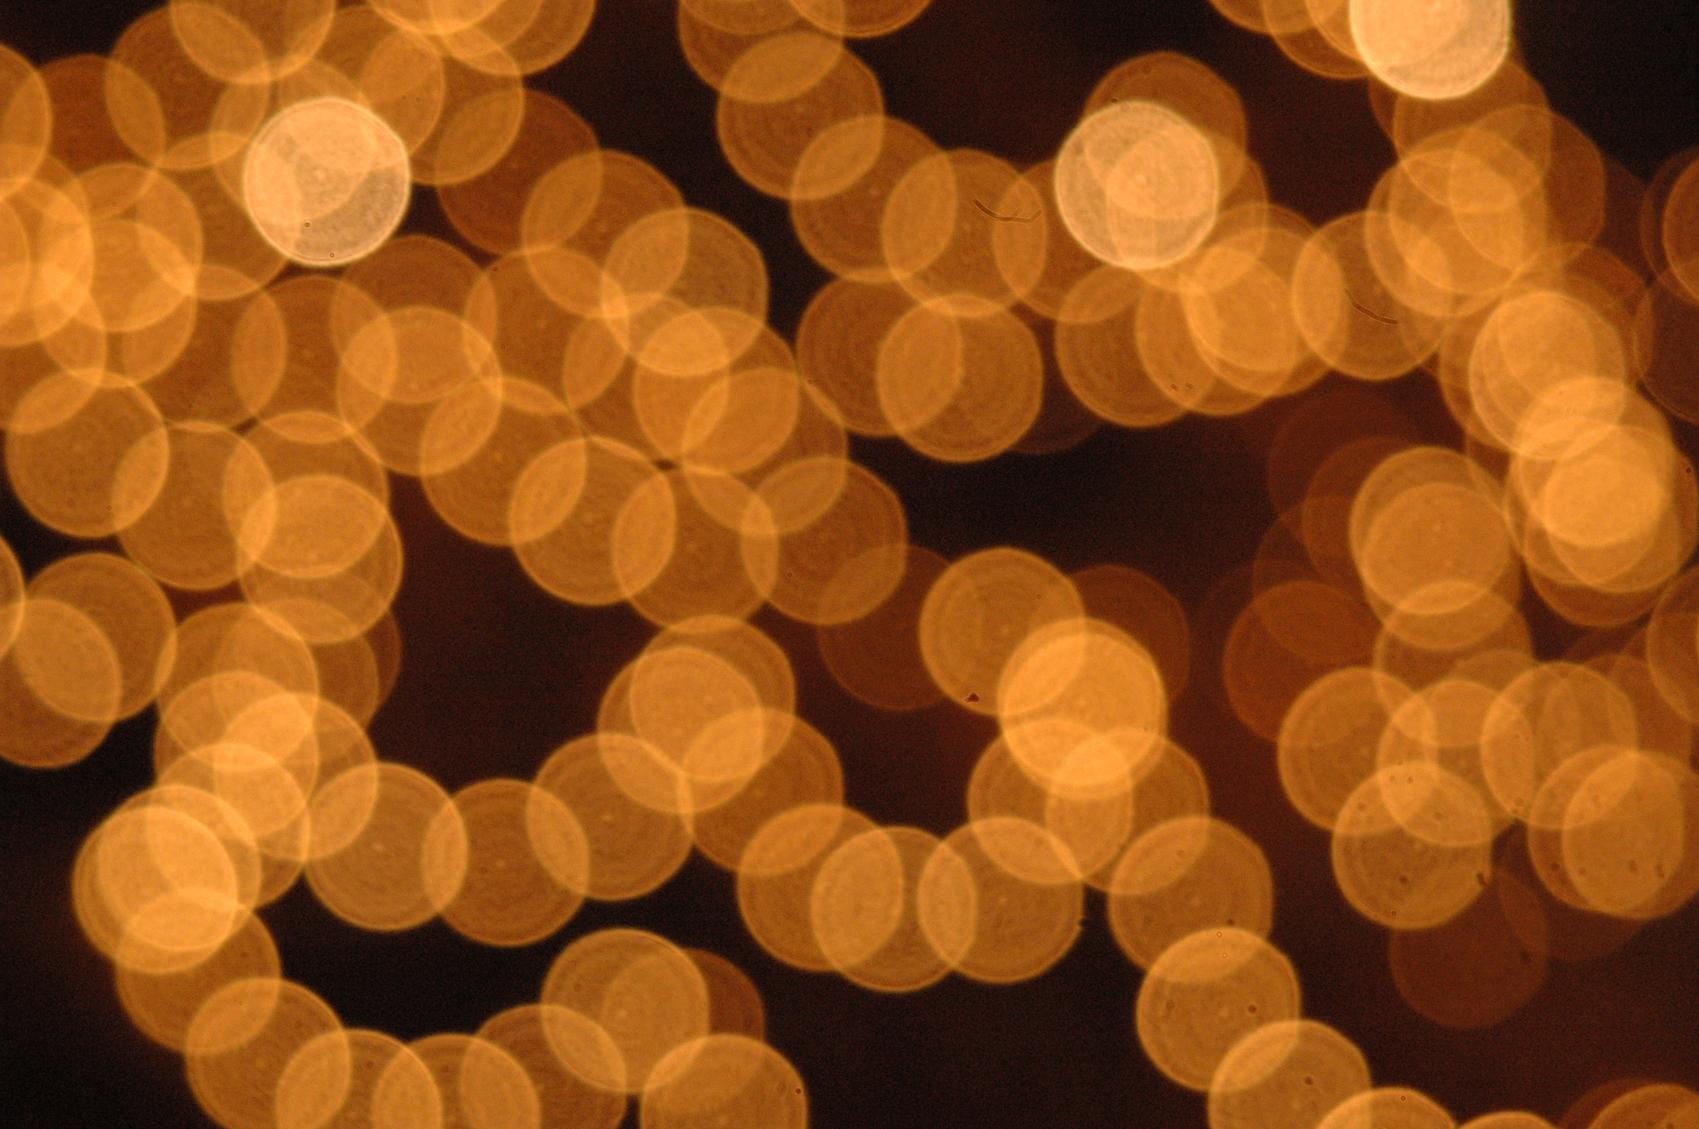 Weihnachtsbeleuchtung instand gesetzt